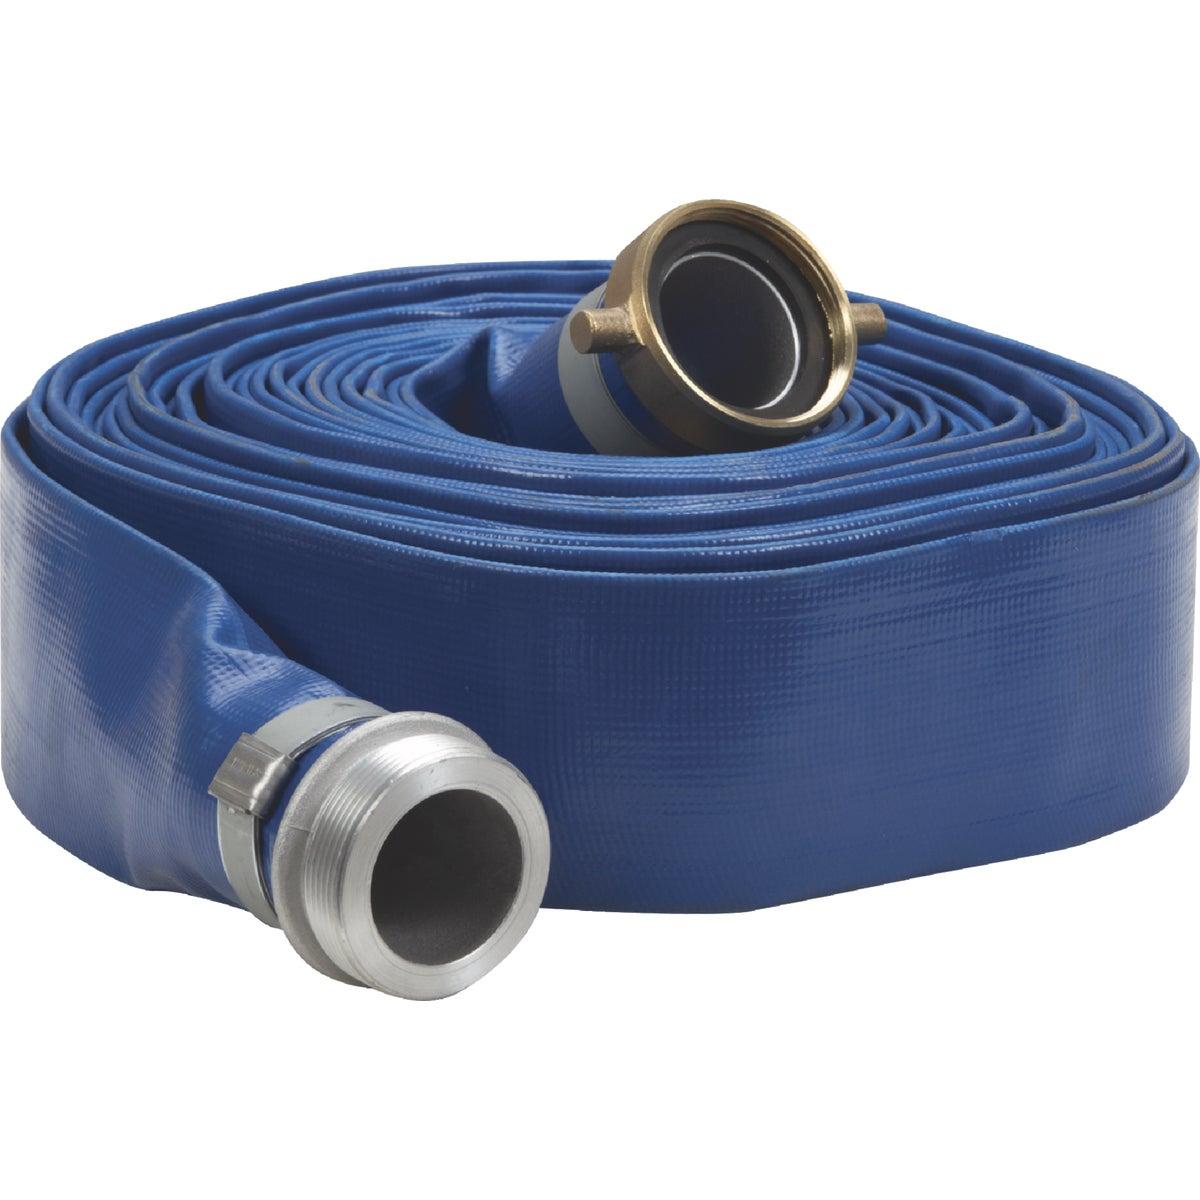 "2""X50'PVC DISCHARGE HOSE - 98138045 by Apache Hose Belting"